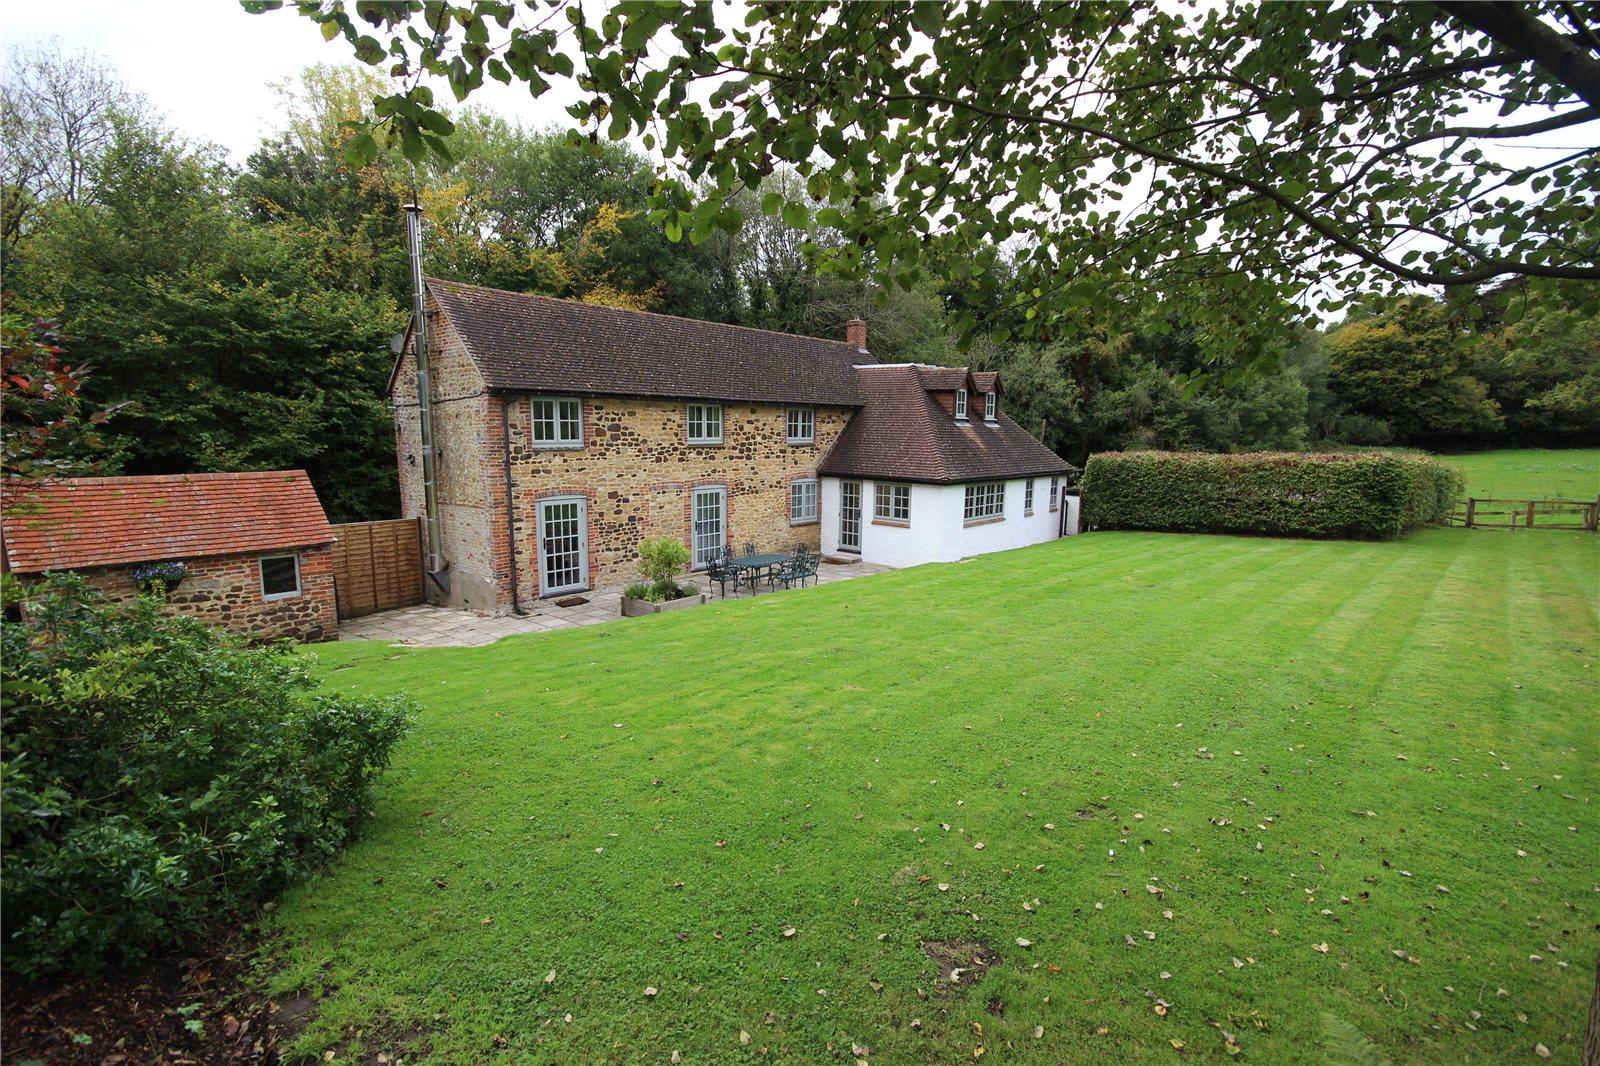 独户住宅 为 销售 在 Lampard Lane, Churt, Farnham, Surrey, GU10 Farnham, 英格兰